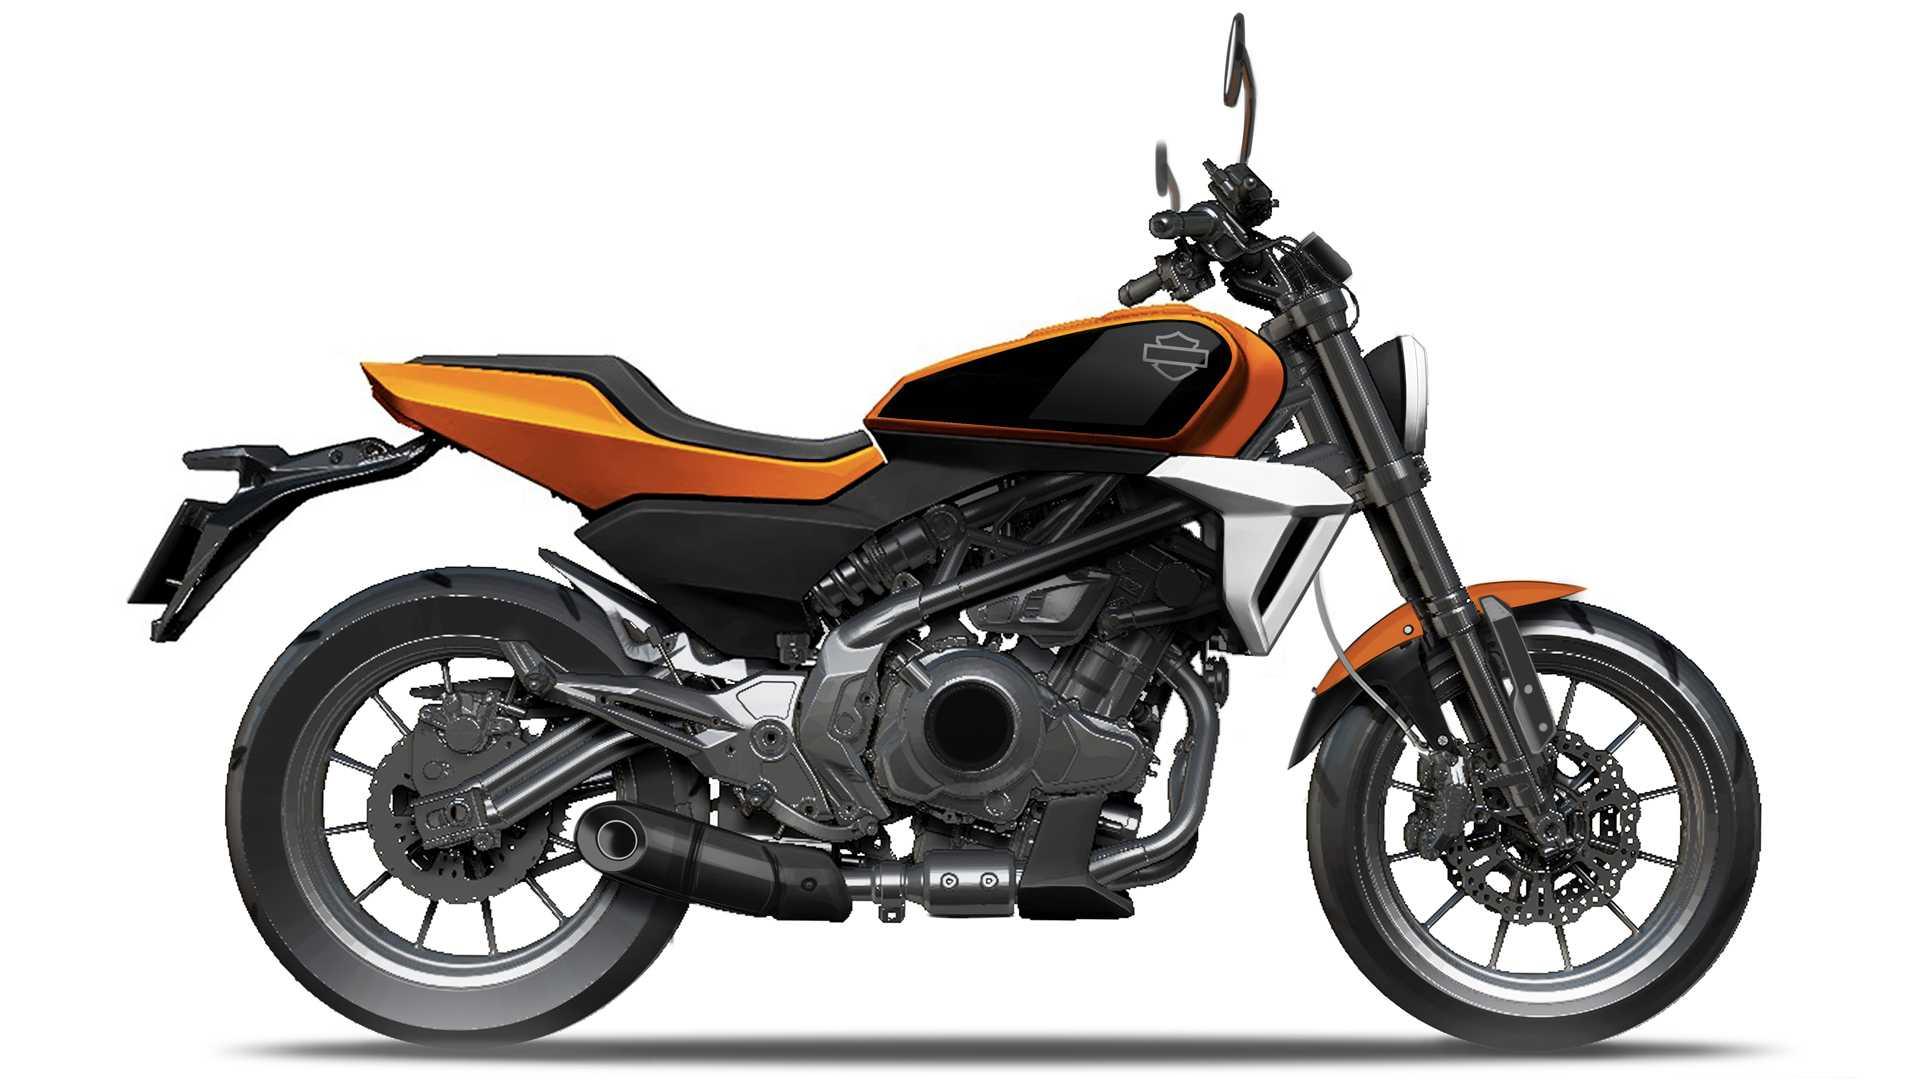 Harley-davidson and Quianjiang Motorcycle Company small displacement motorcycle